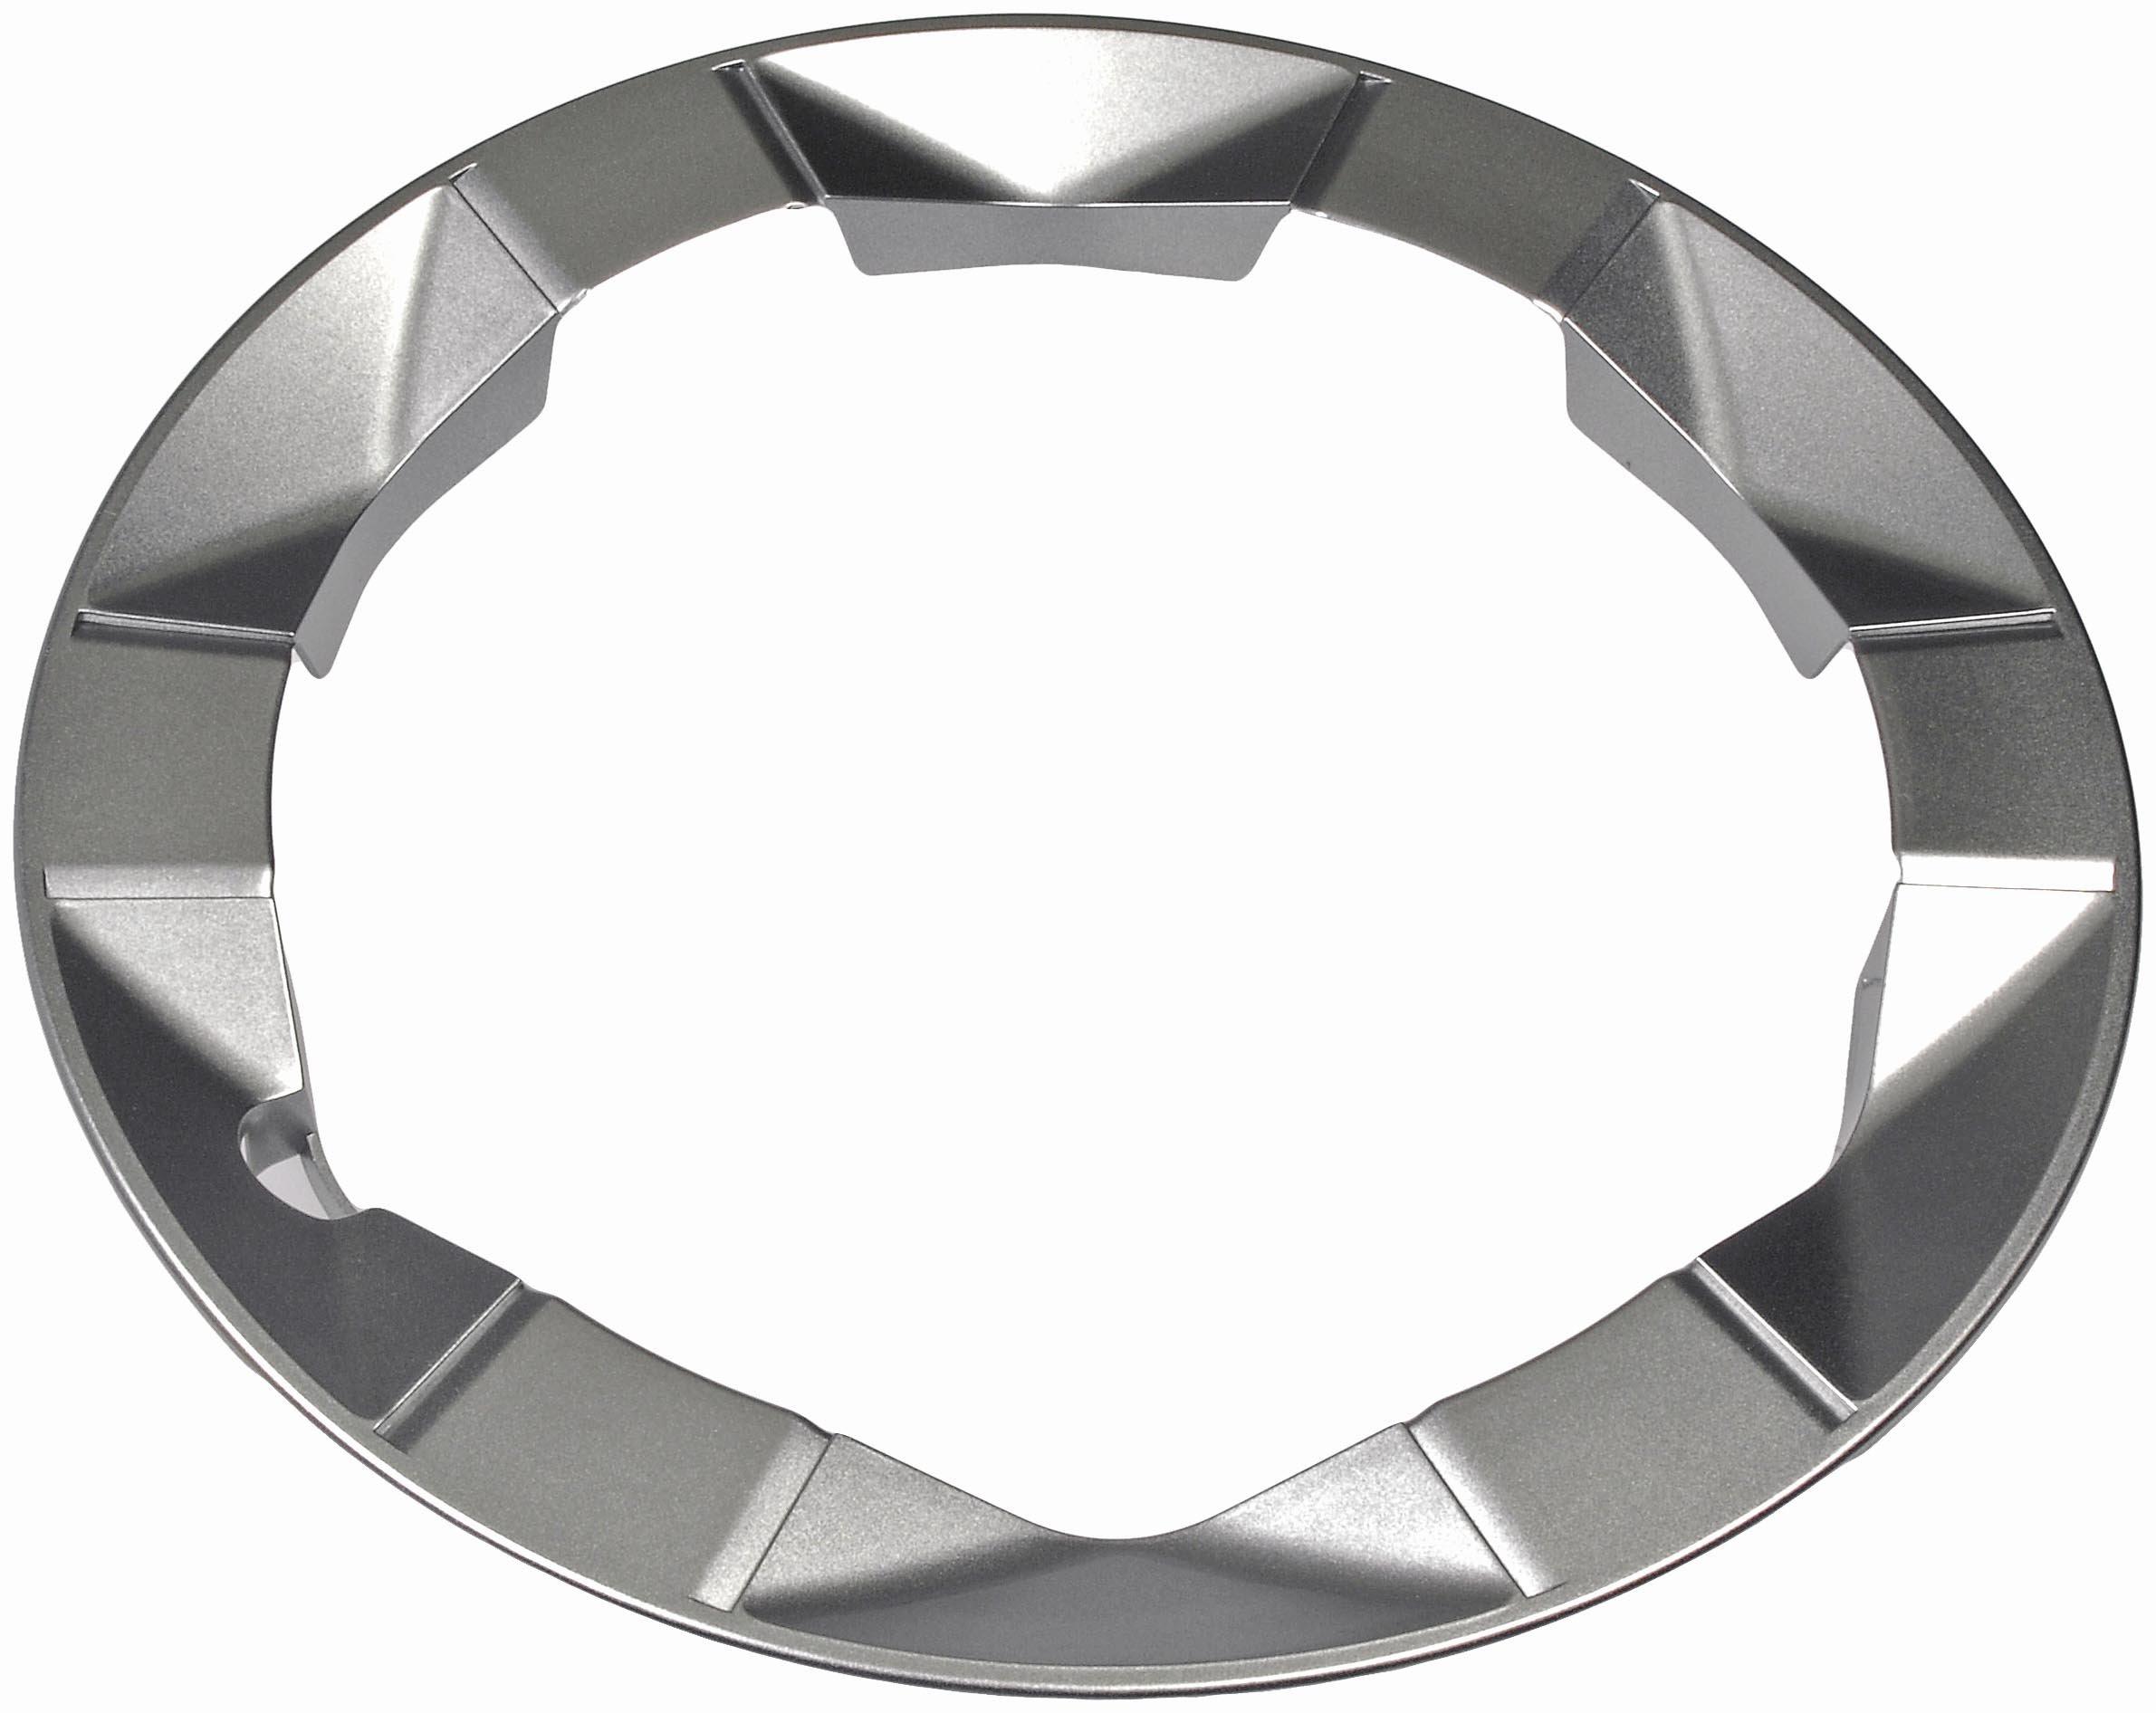 DORMAN 909-900 Wheel Trim Ring by Dorman